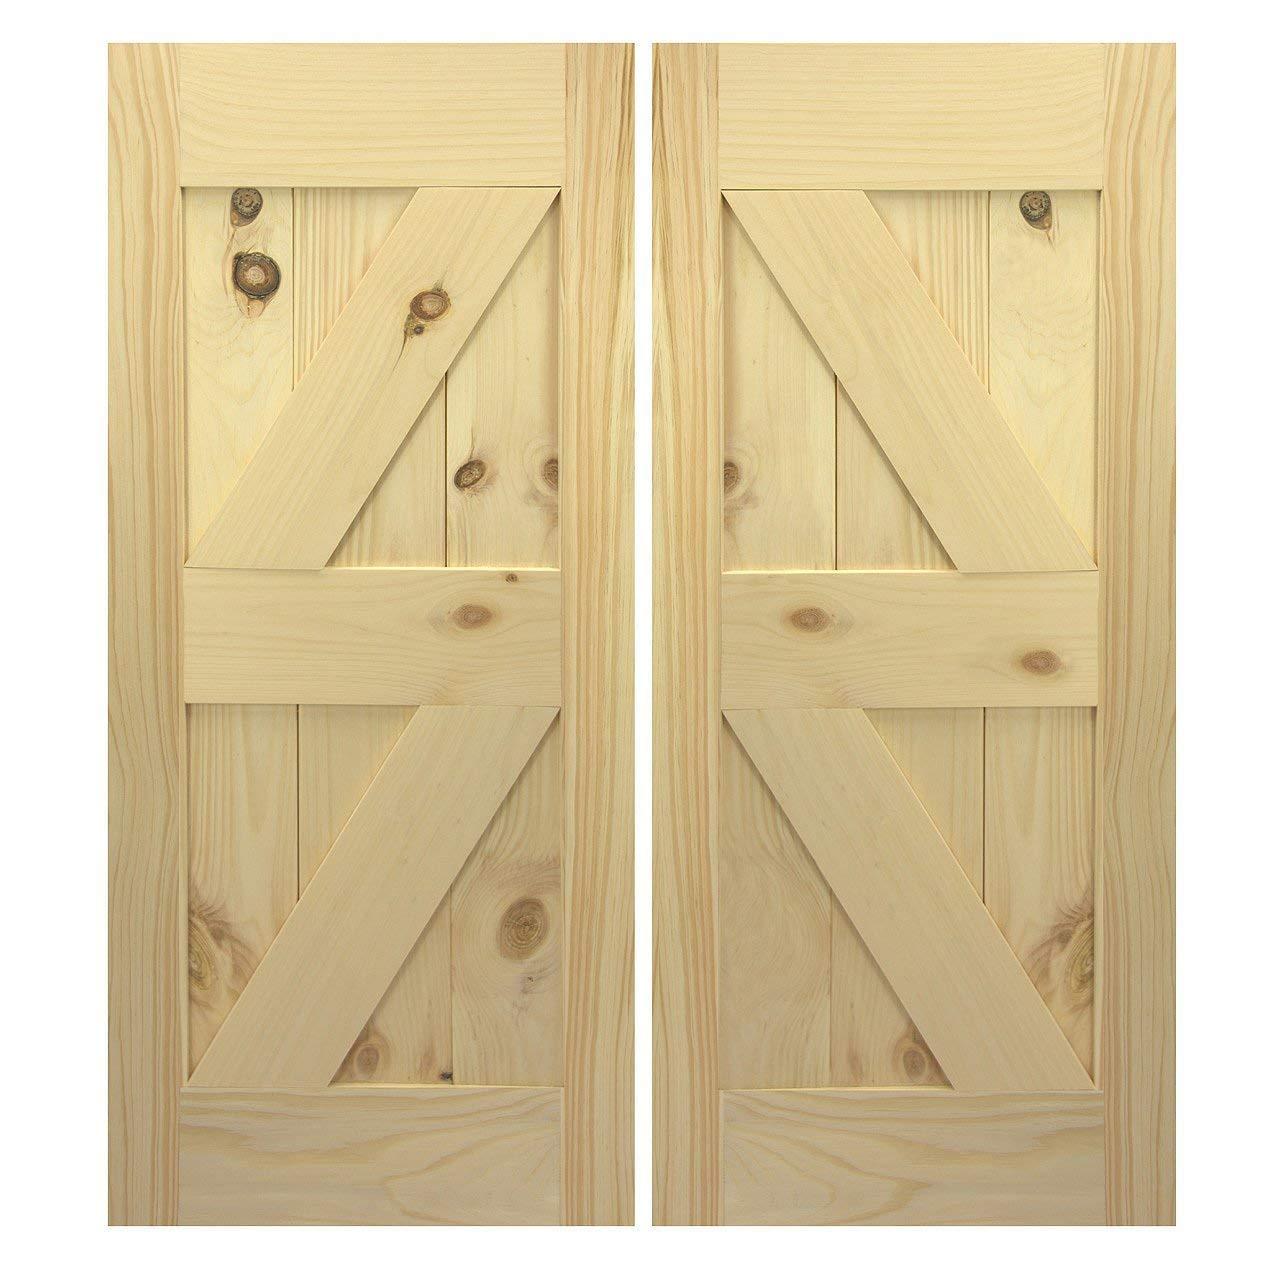 Amazon Com Interior Barn Doors Closet Barn Doors Swinging Cafe Doors Handmade